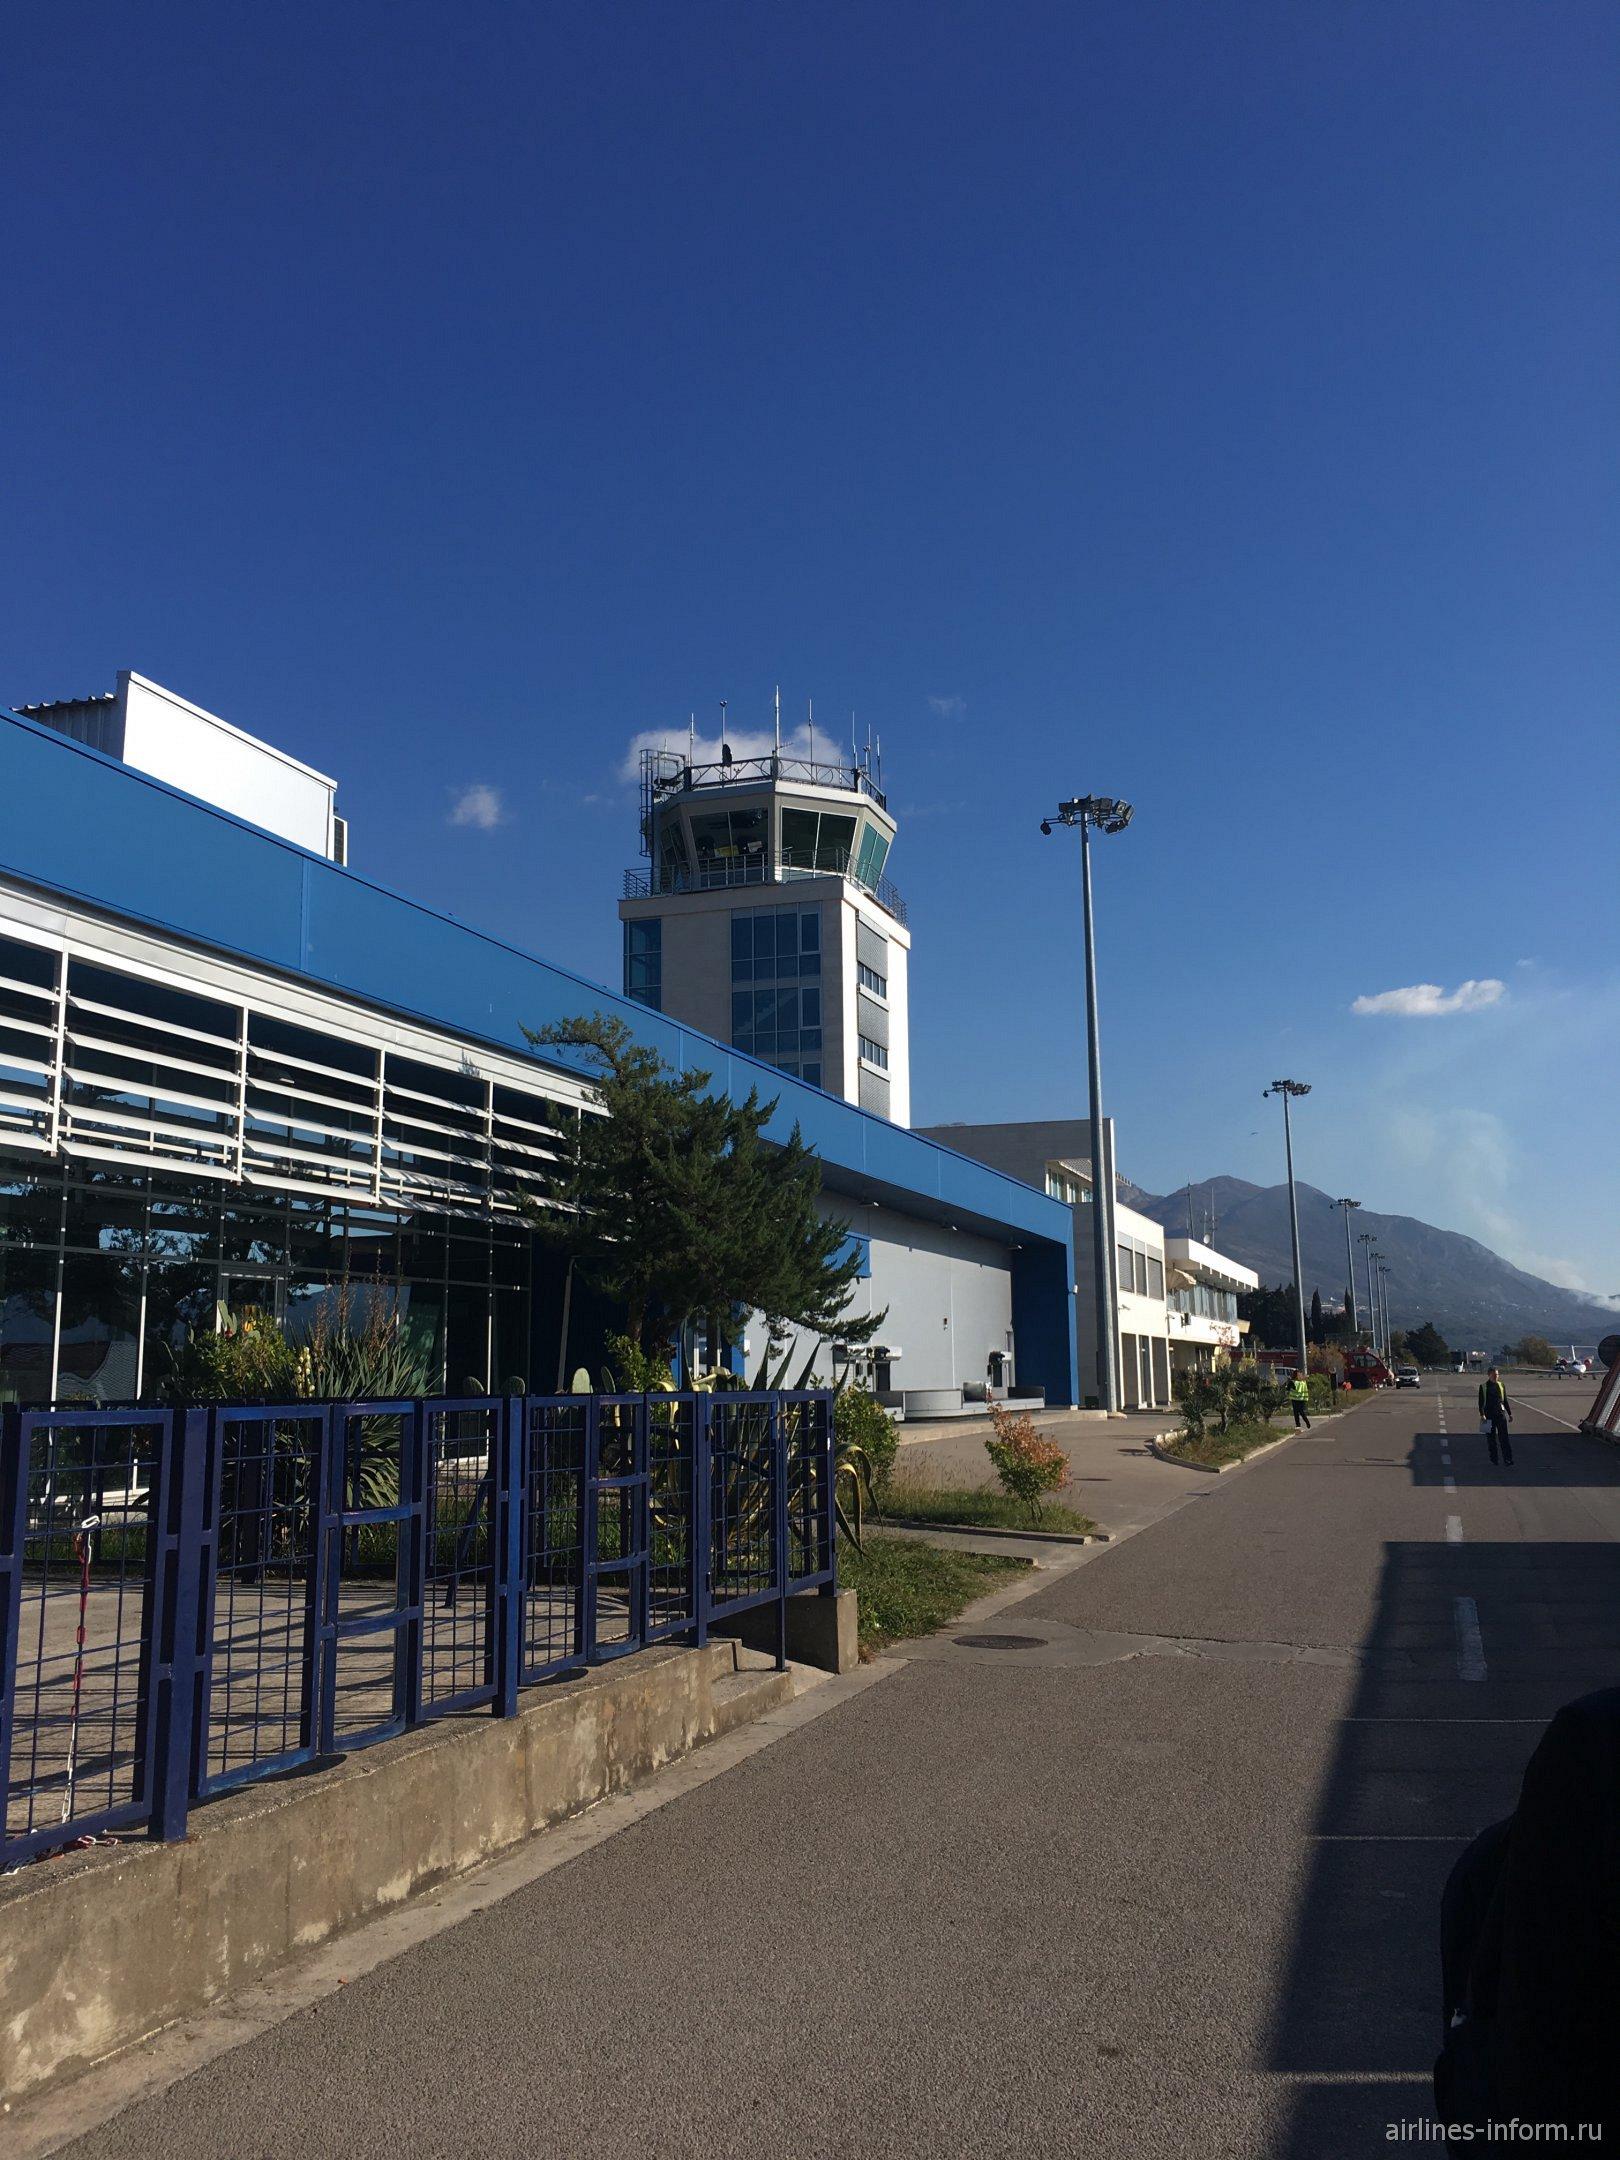 Вид на пассажирский терминал аэропорта Тиват со стороны перрона